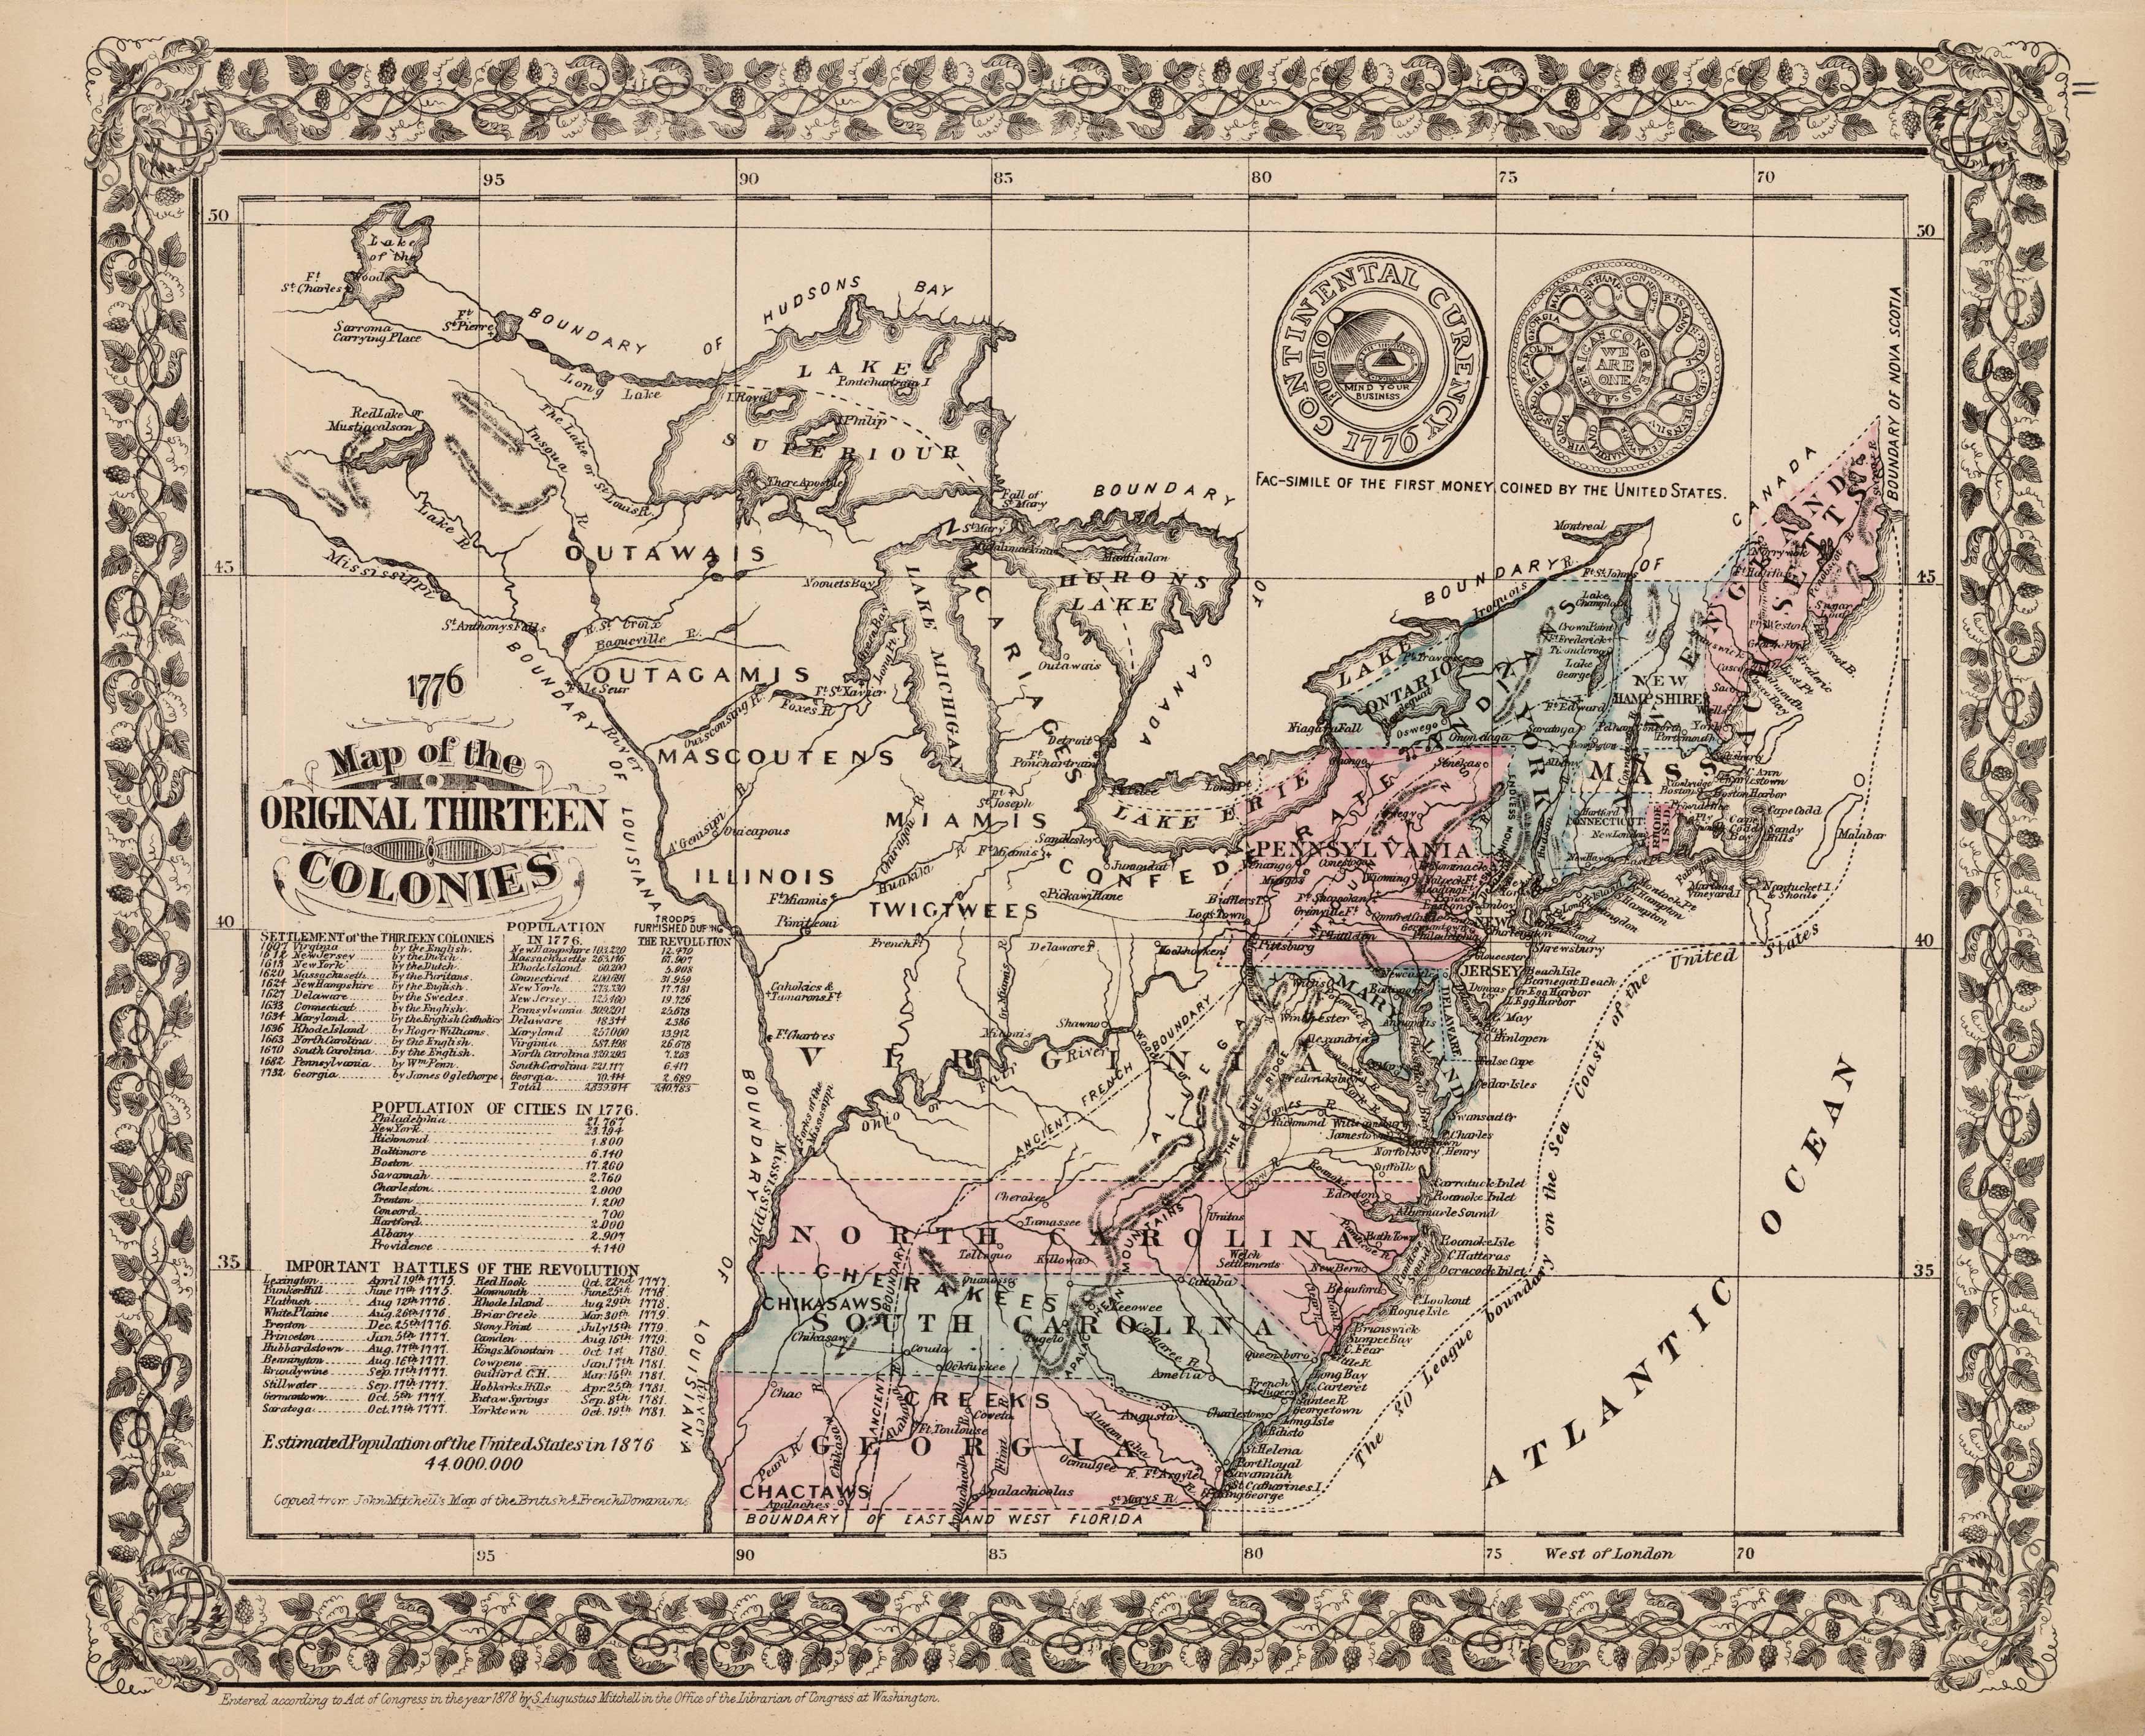 Map of the Original Thirteen Colonies